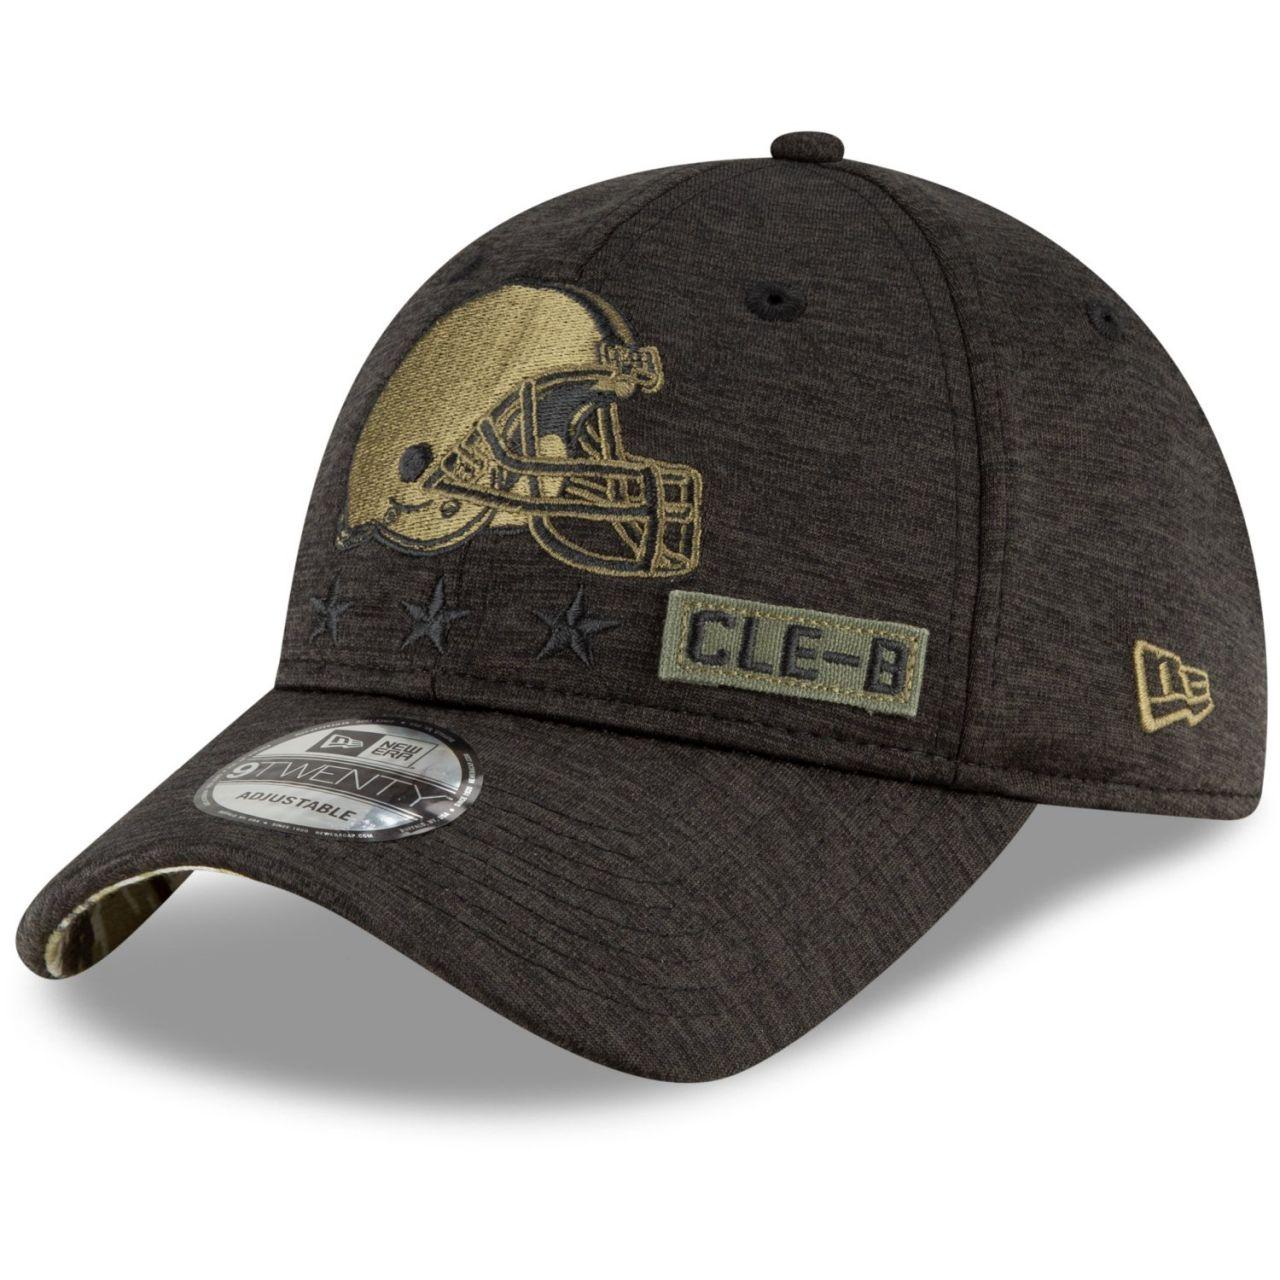 amfoo - New Era 9TWENTY Cap Salute to Service Cleveland Browns